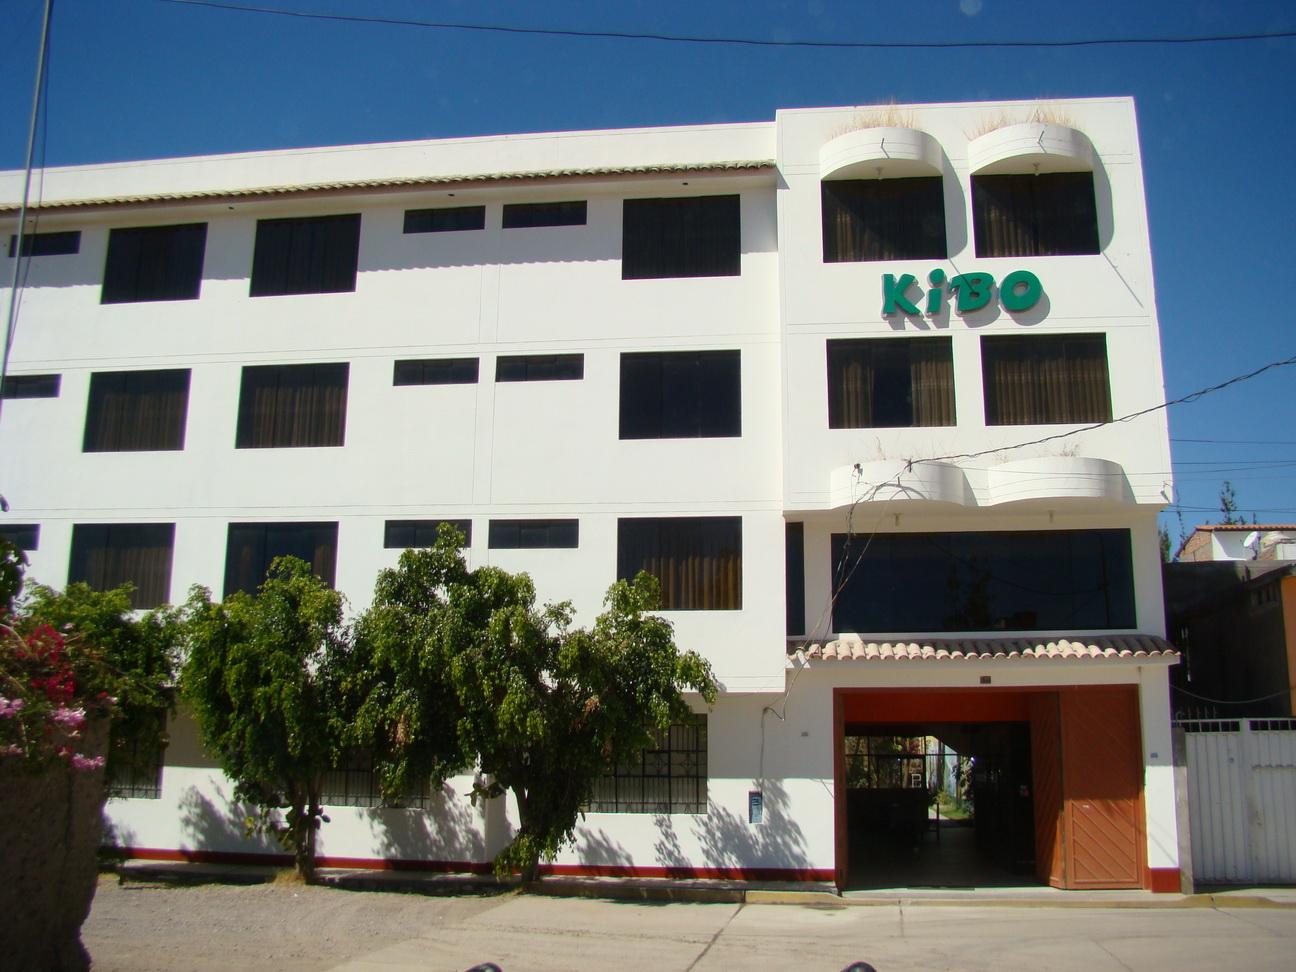 kibo-hotel-ayacucho-1